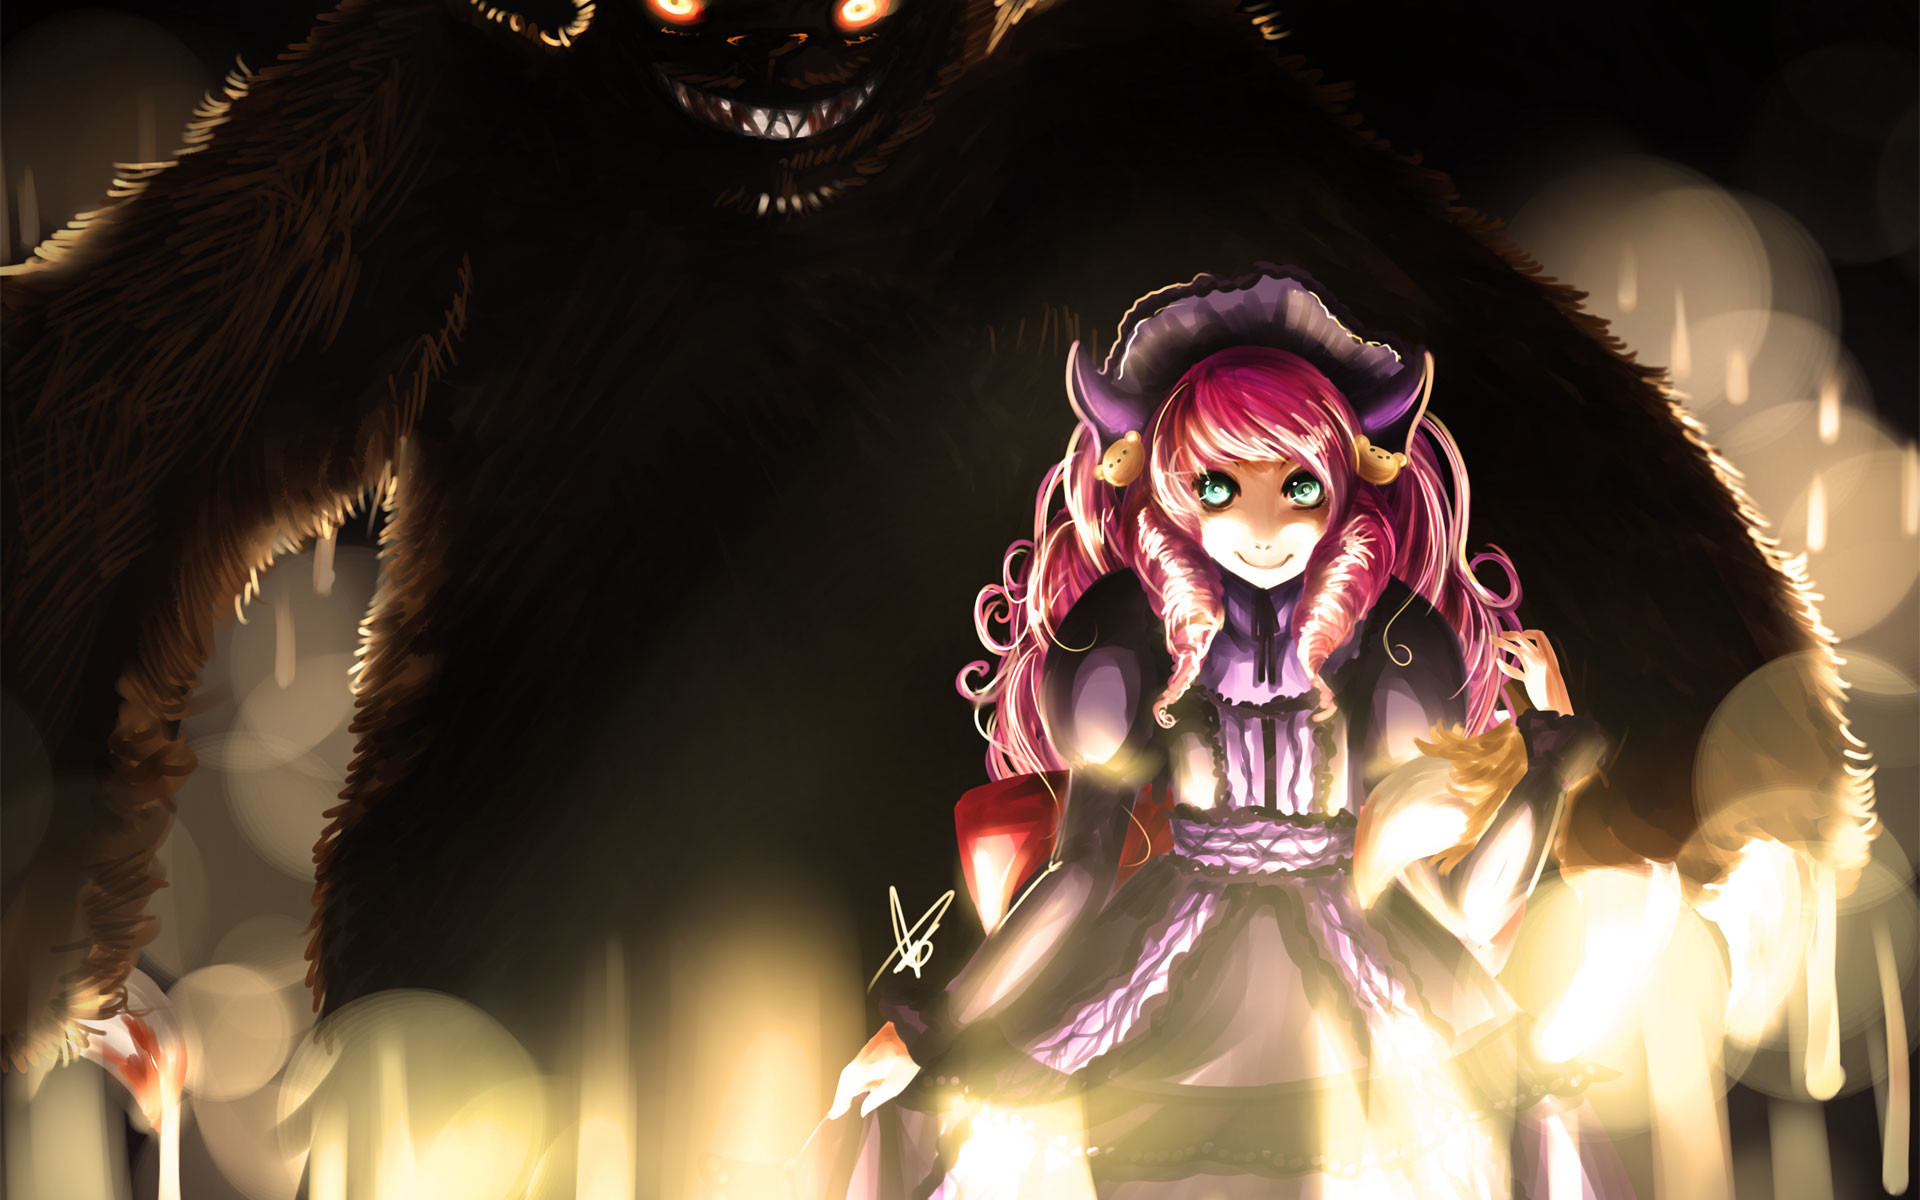 League of Legends Drawing fantasy monster girl wallpaper | |  52142 | WallpaperUP